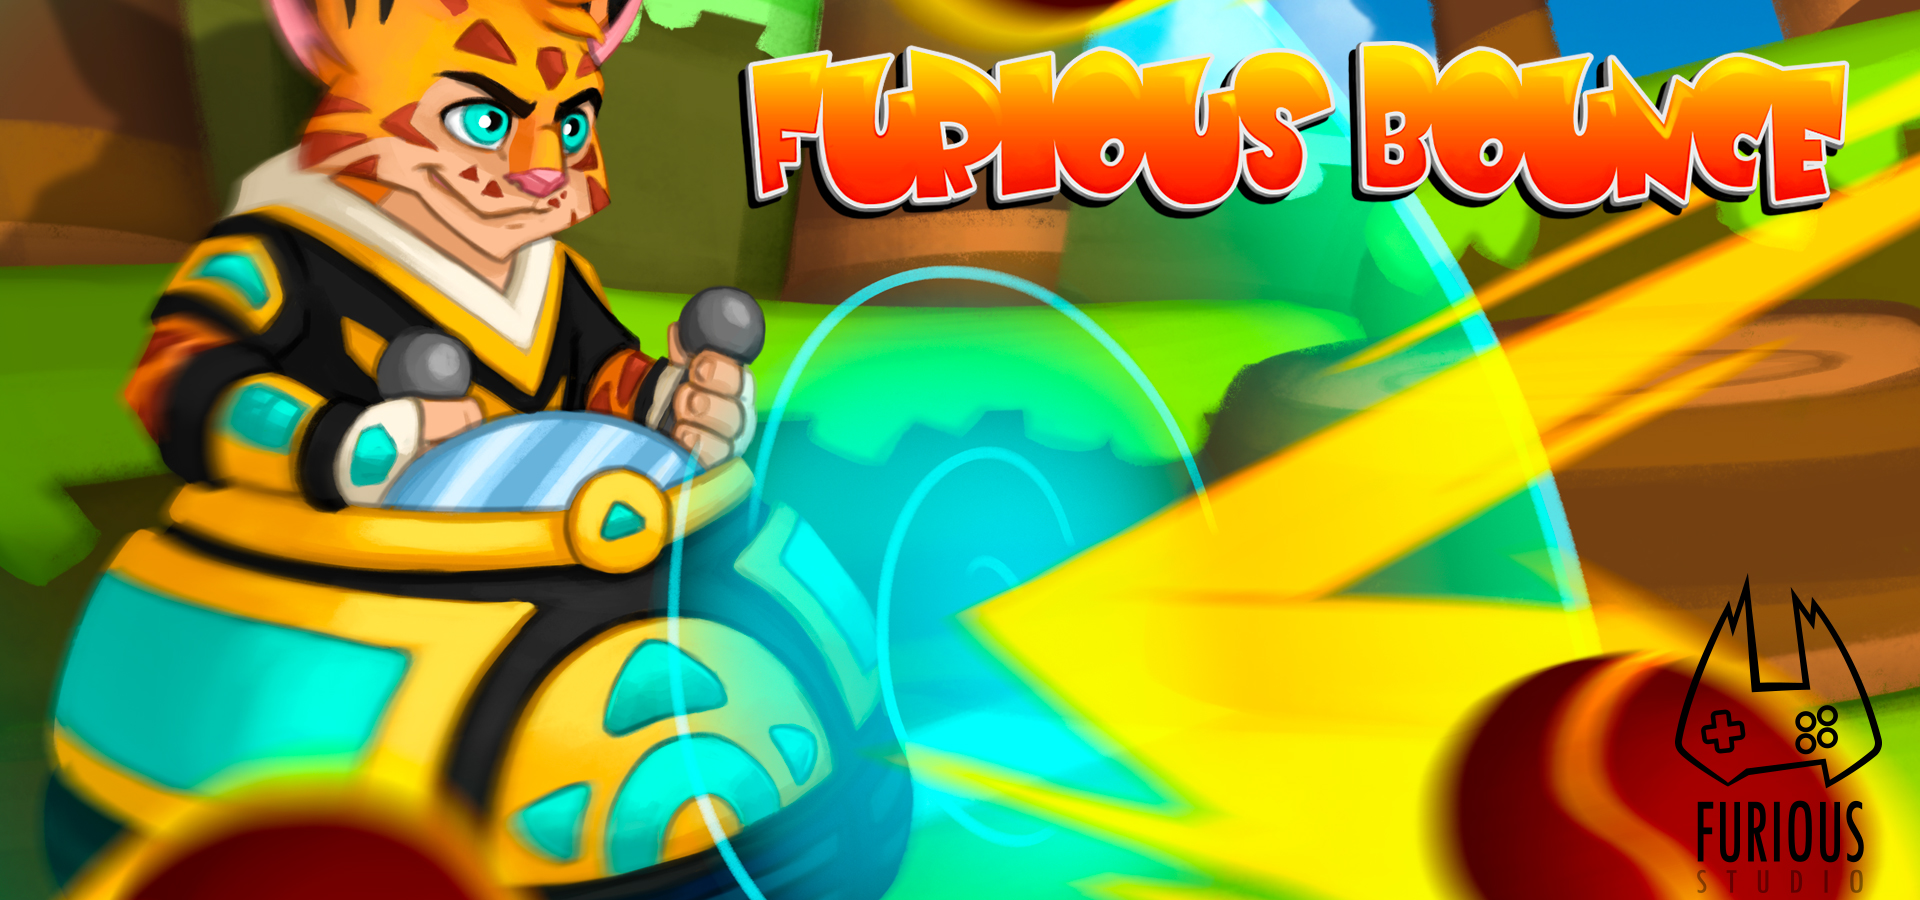 Furious Bounce